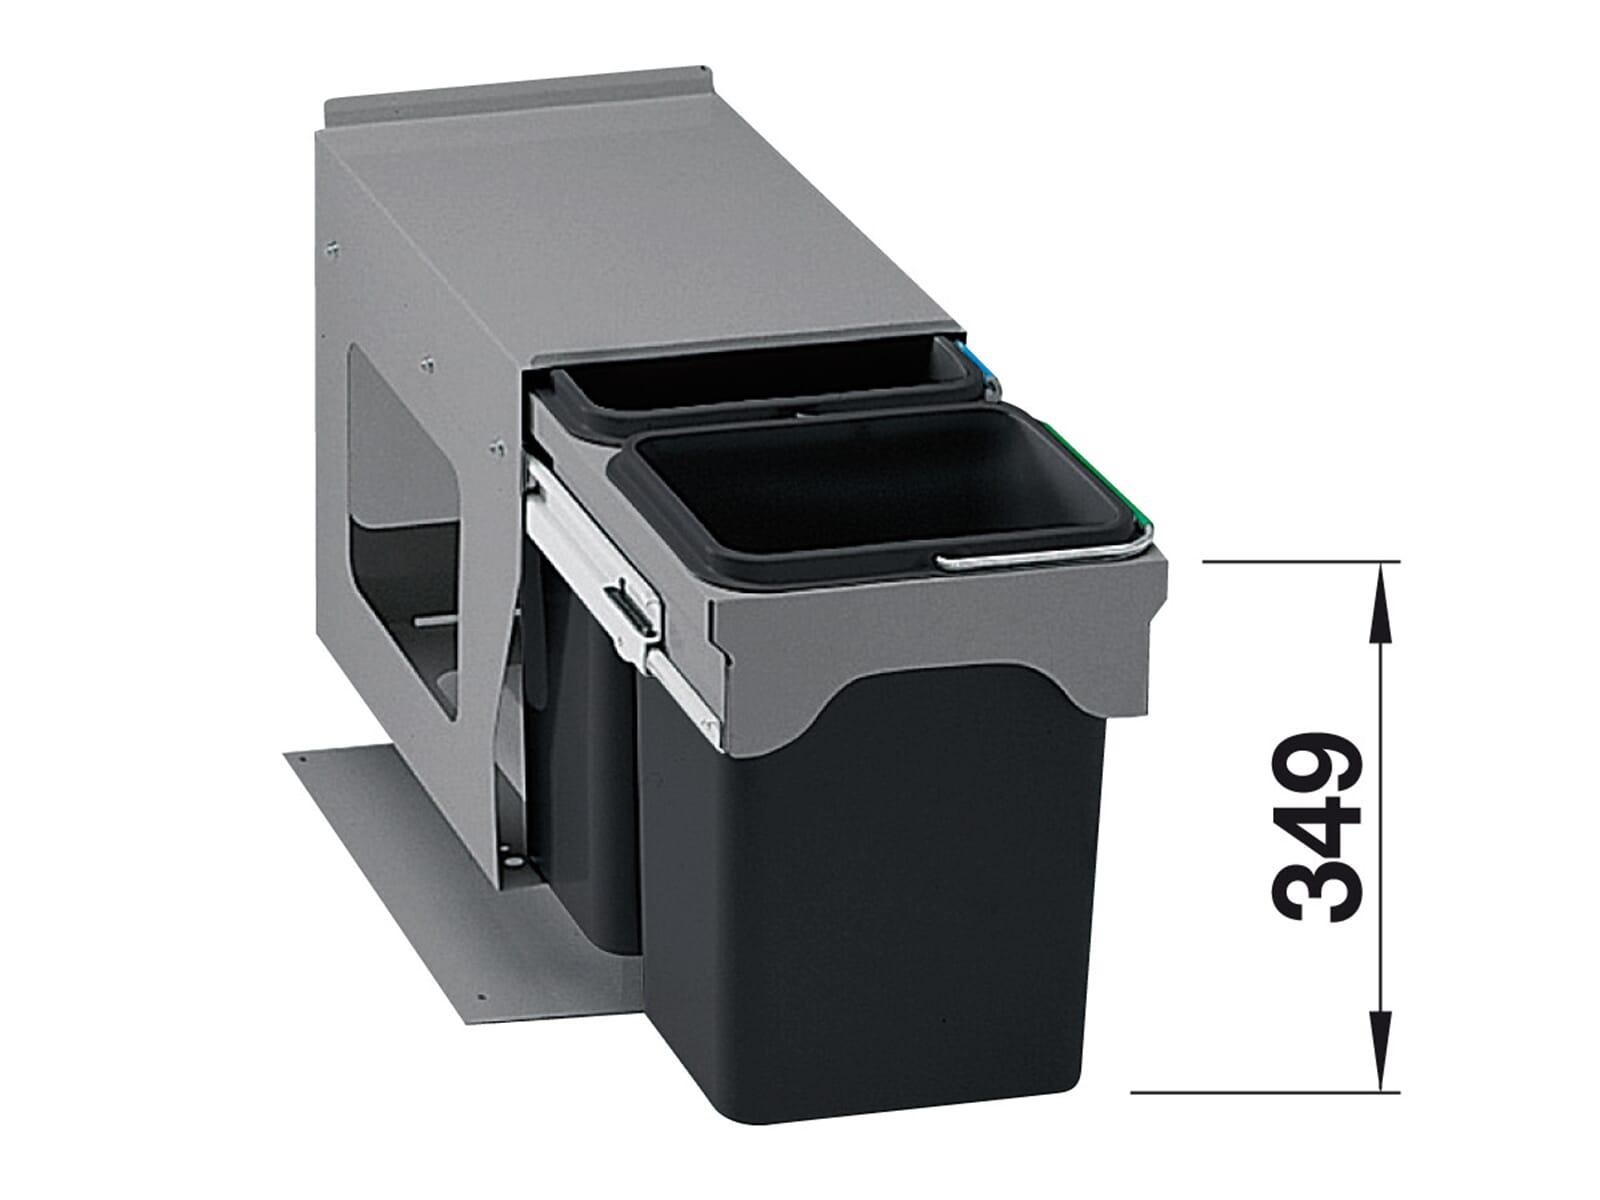 küche abfallsystem - 54 images - ergo master arbeitsplatten ...